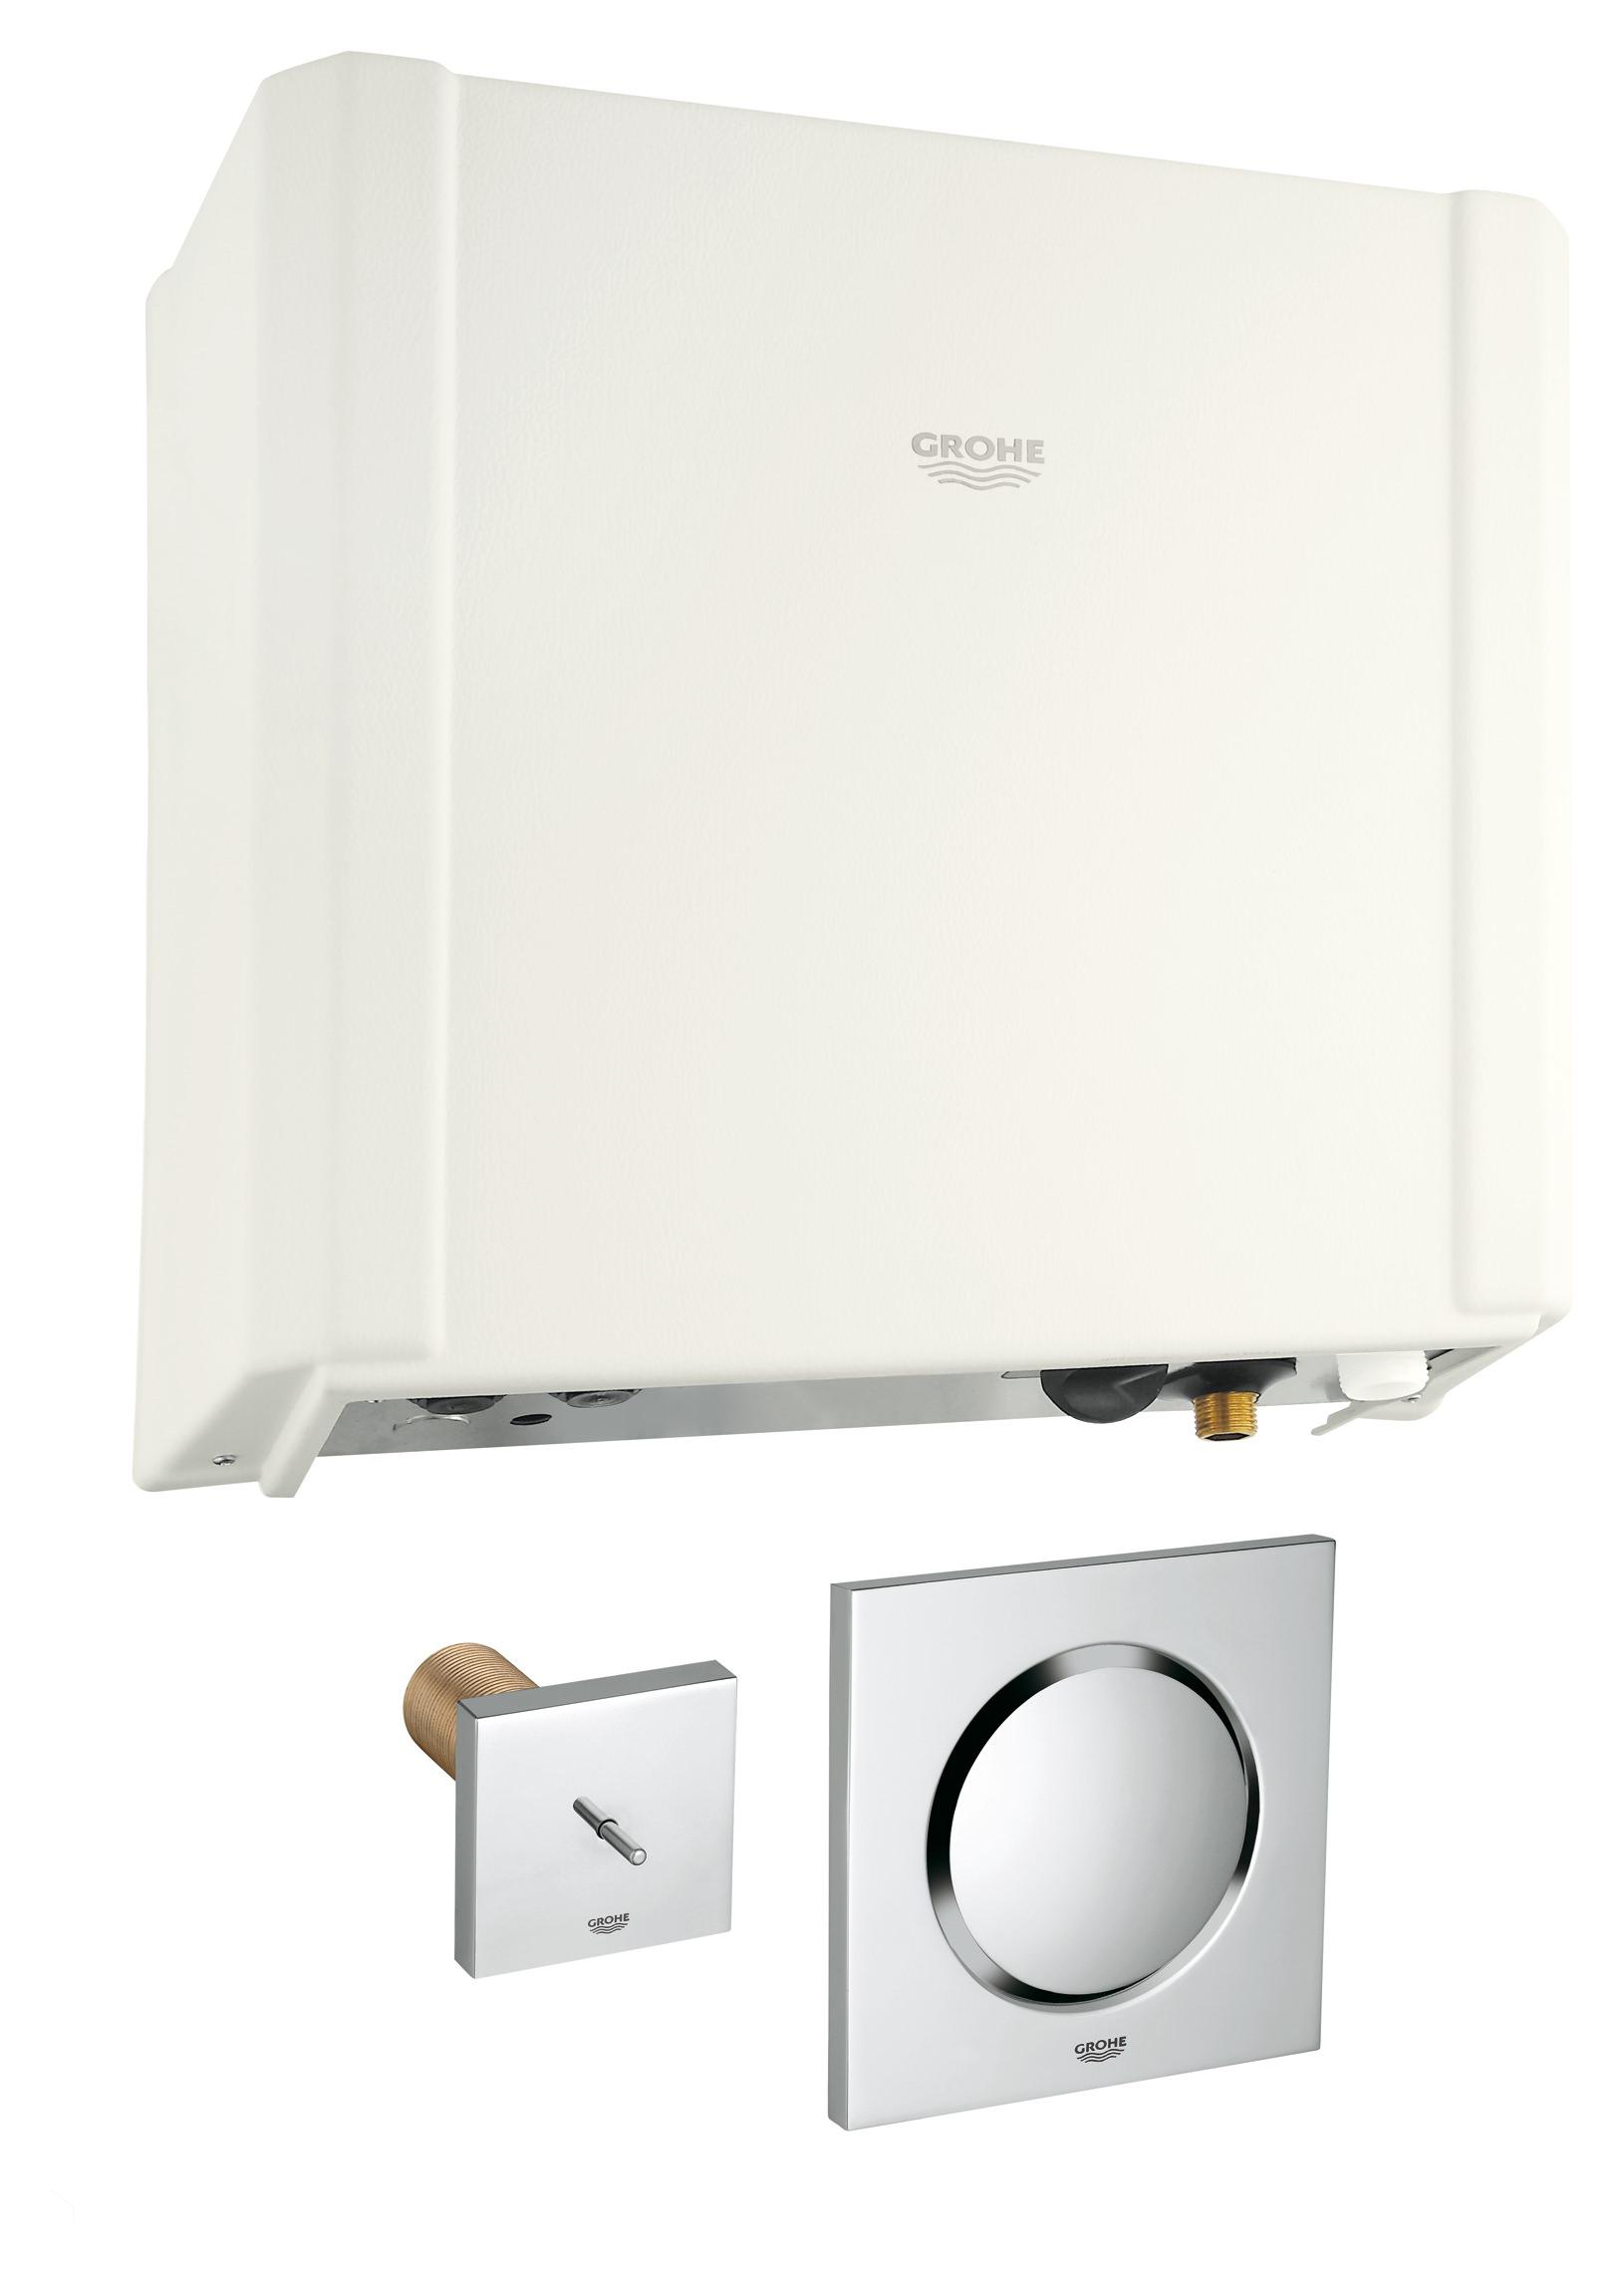 grohe f digital deluxe dampfgenerator mit dampfauslass und temperaturf hler 27934000. Black Bedroom Furniture Sets. Home Design Ideas